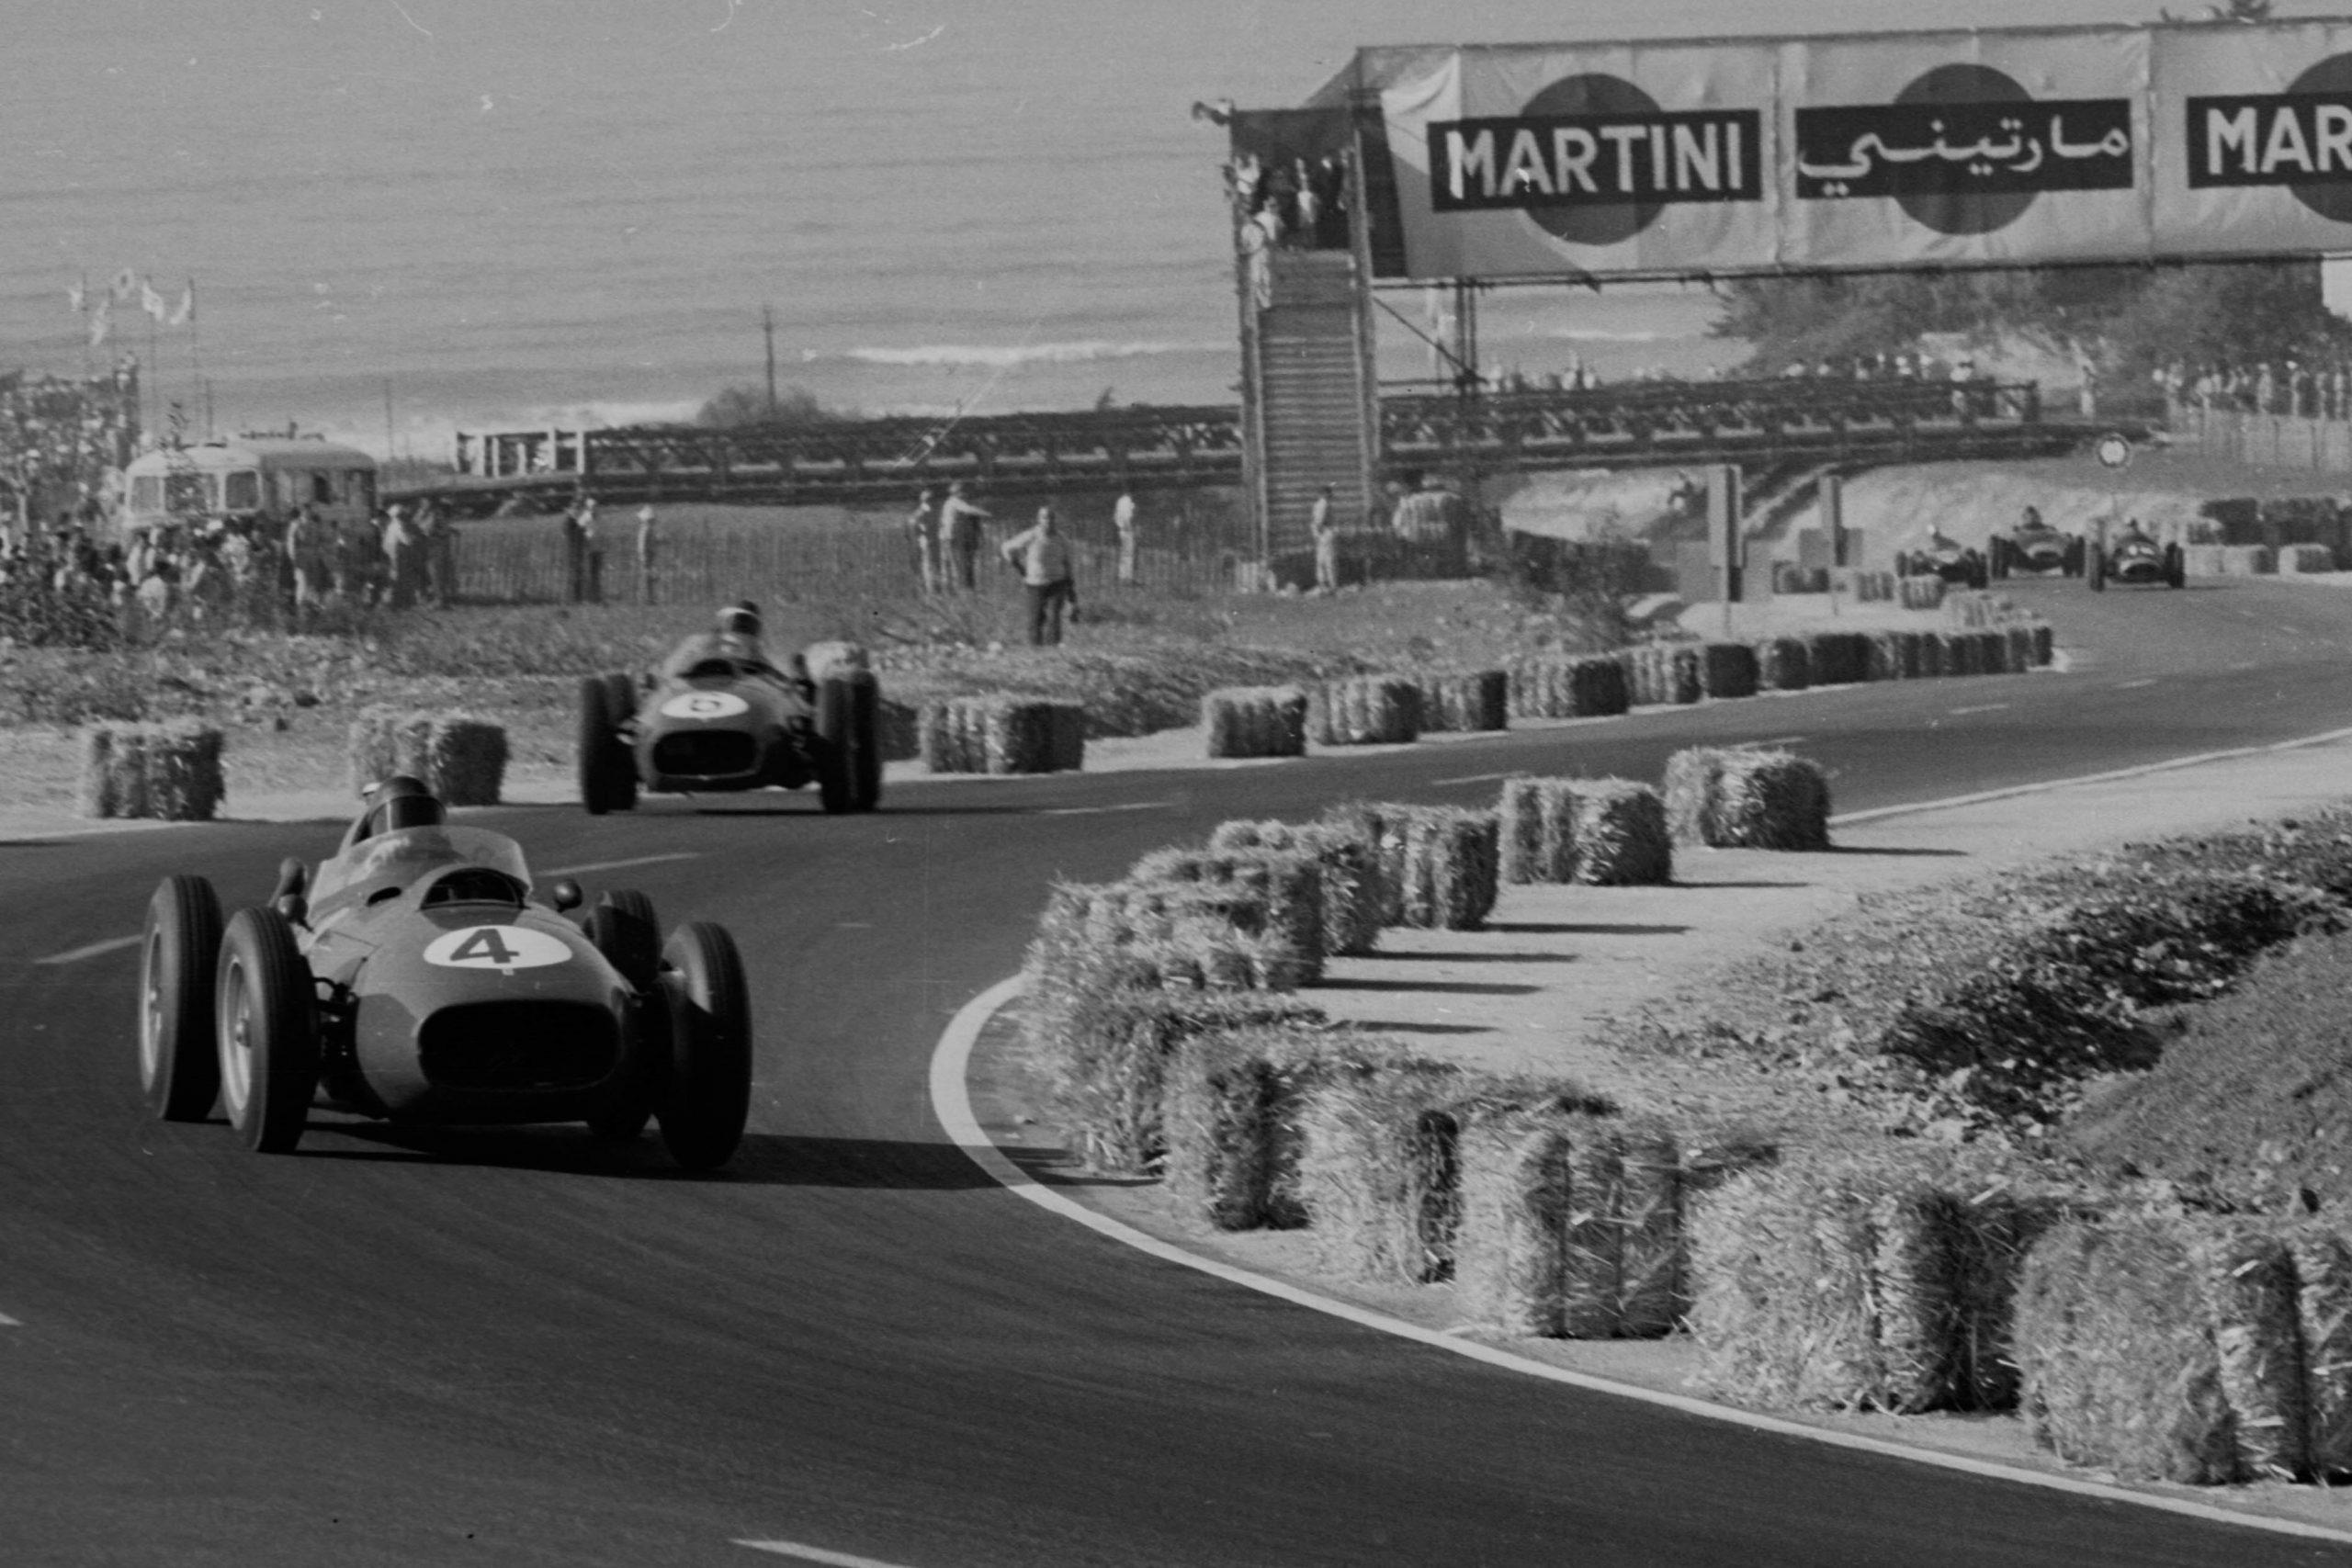 Phil Hill leads Mike Hawthorn in Ferrari Dino 246's.